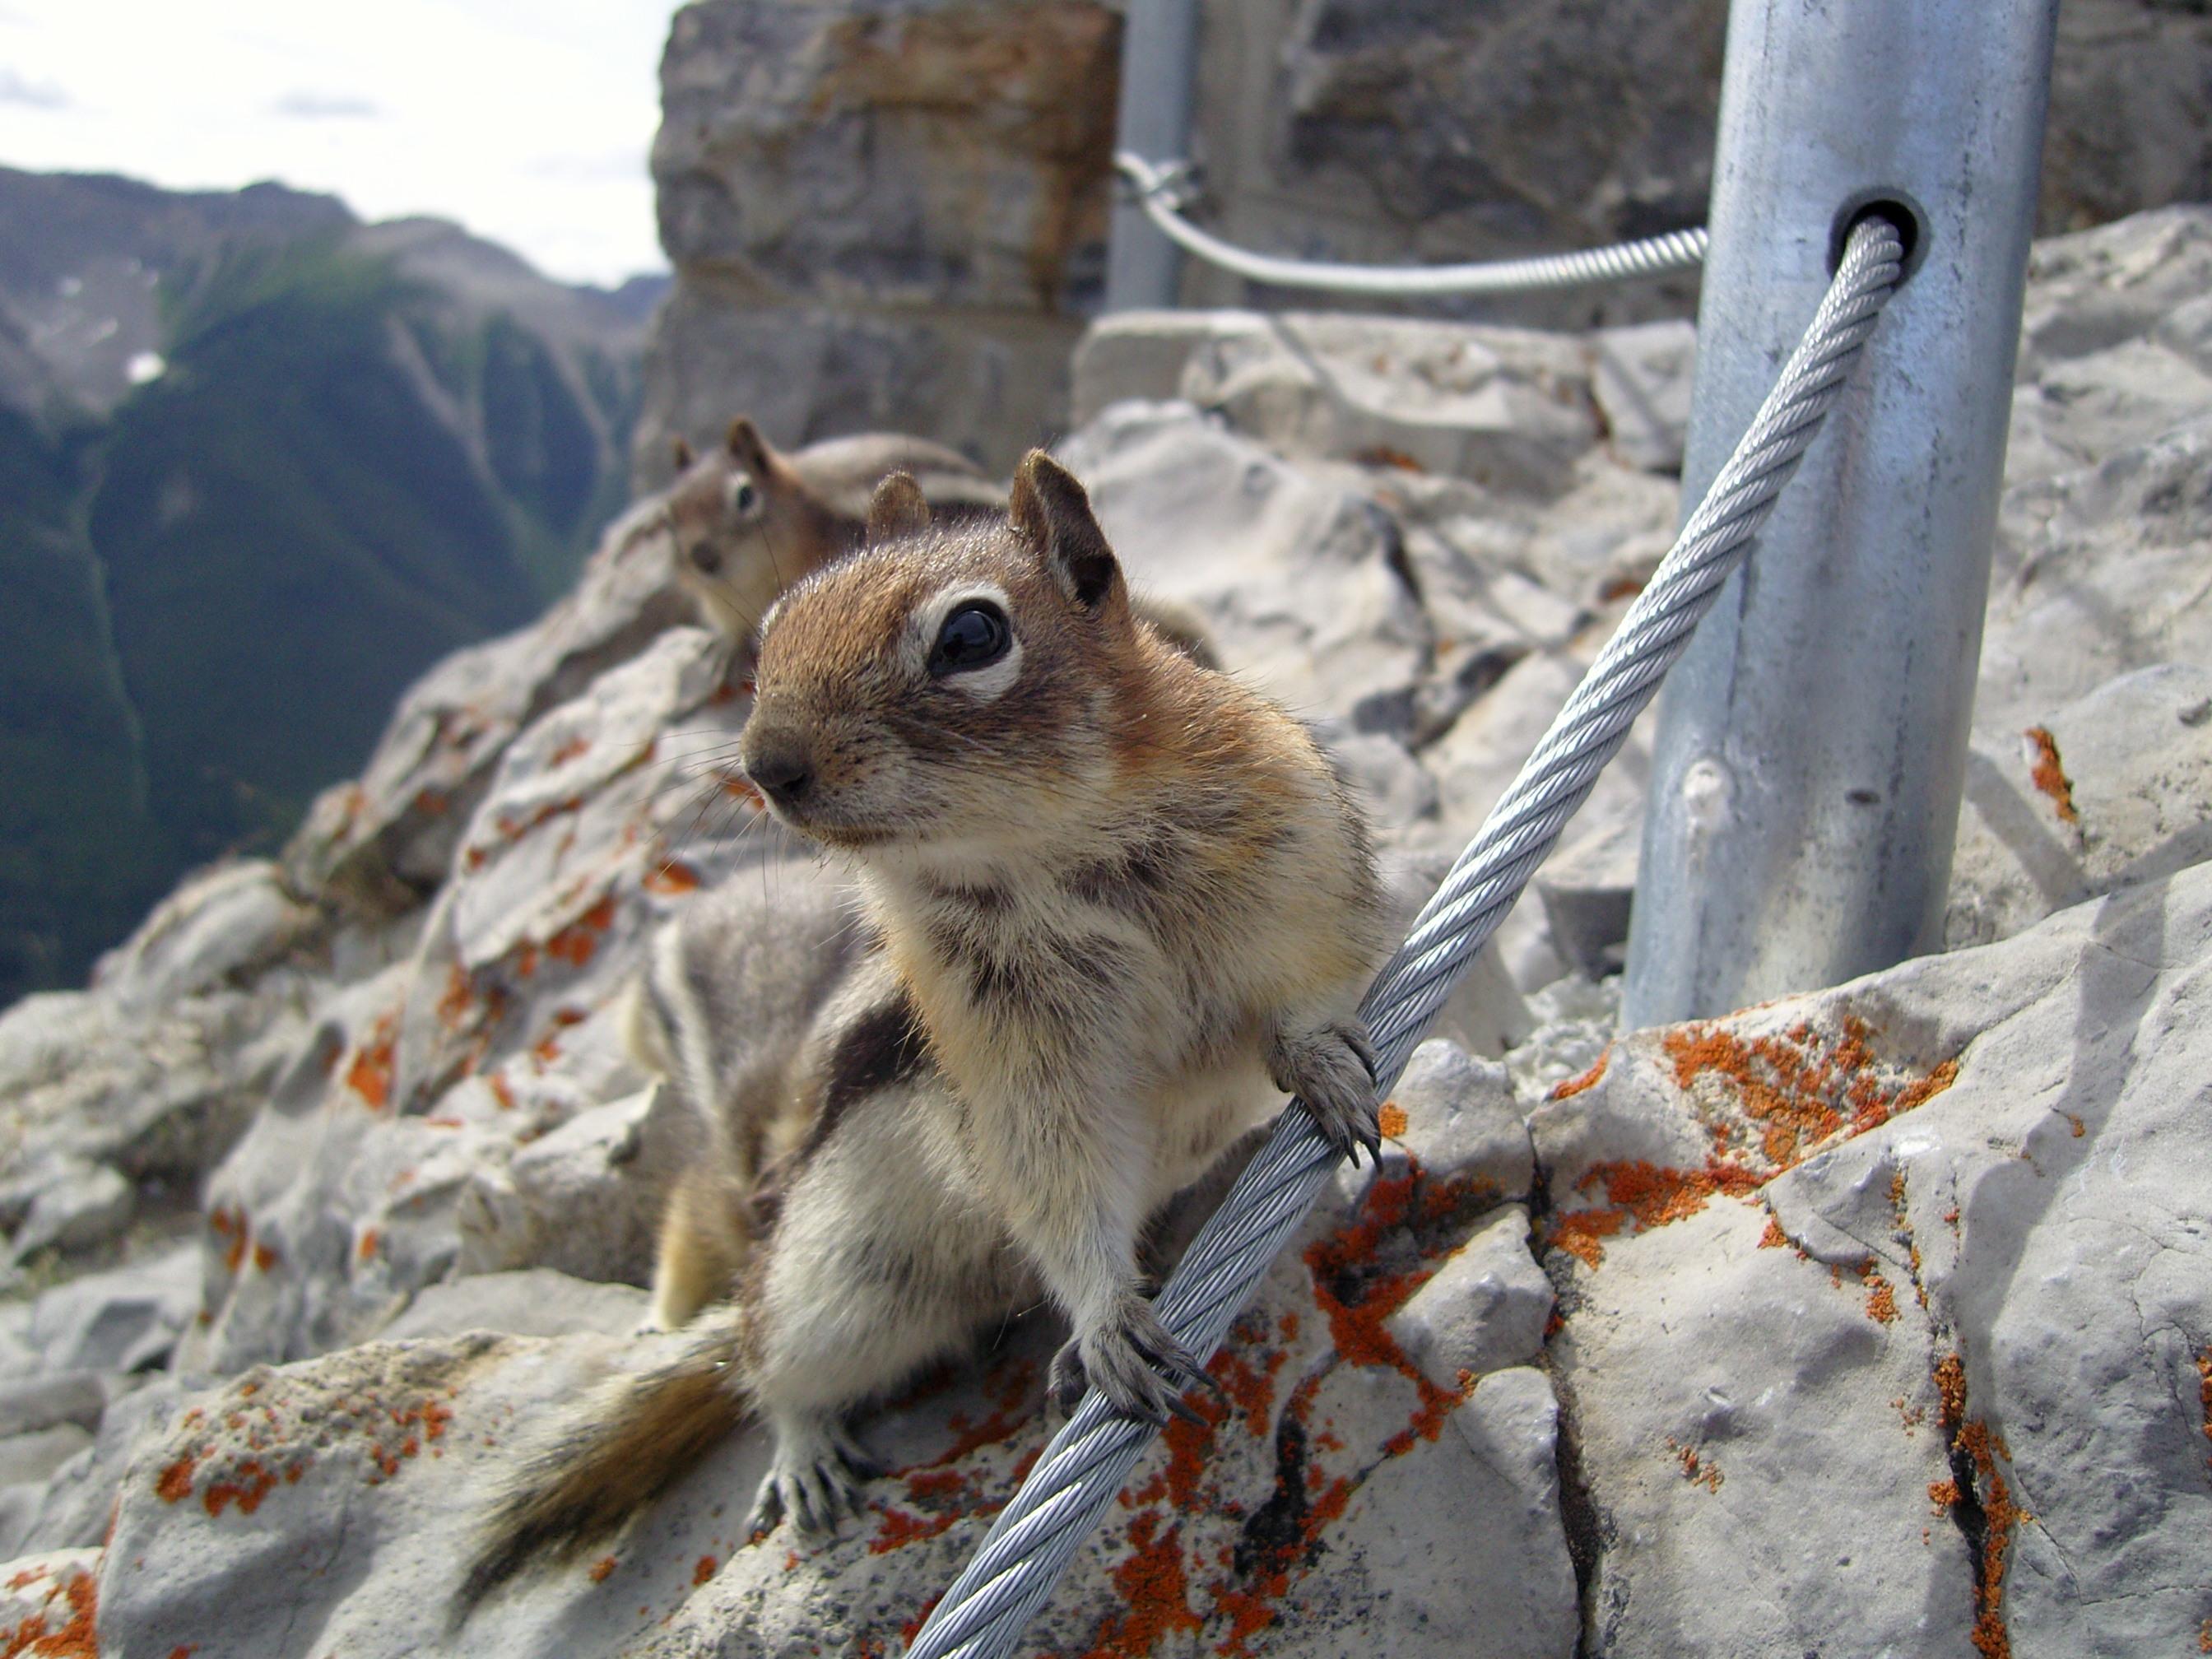 Cartoon Squirrel hijacks vacation photo